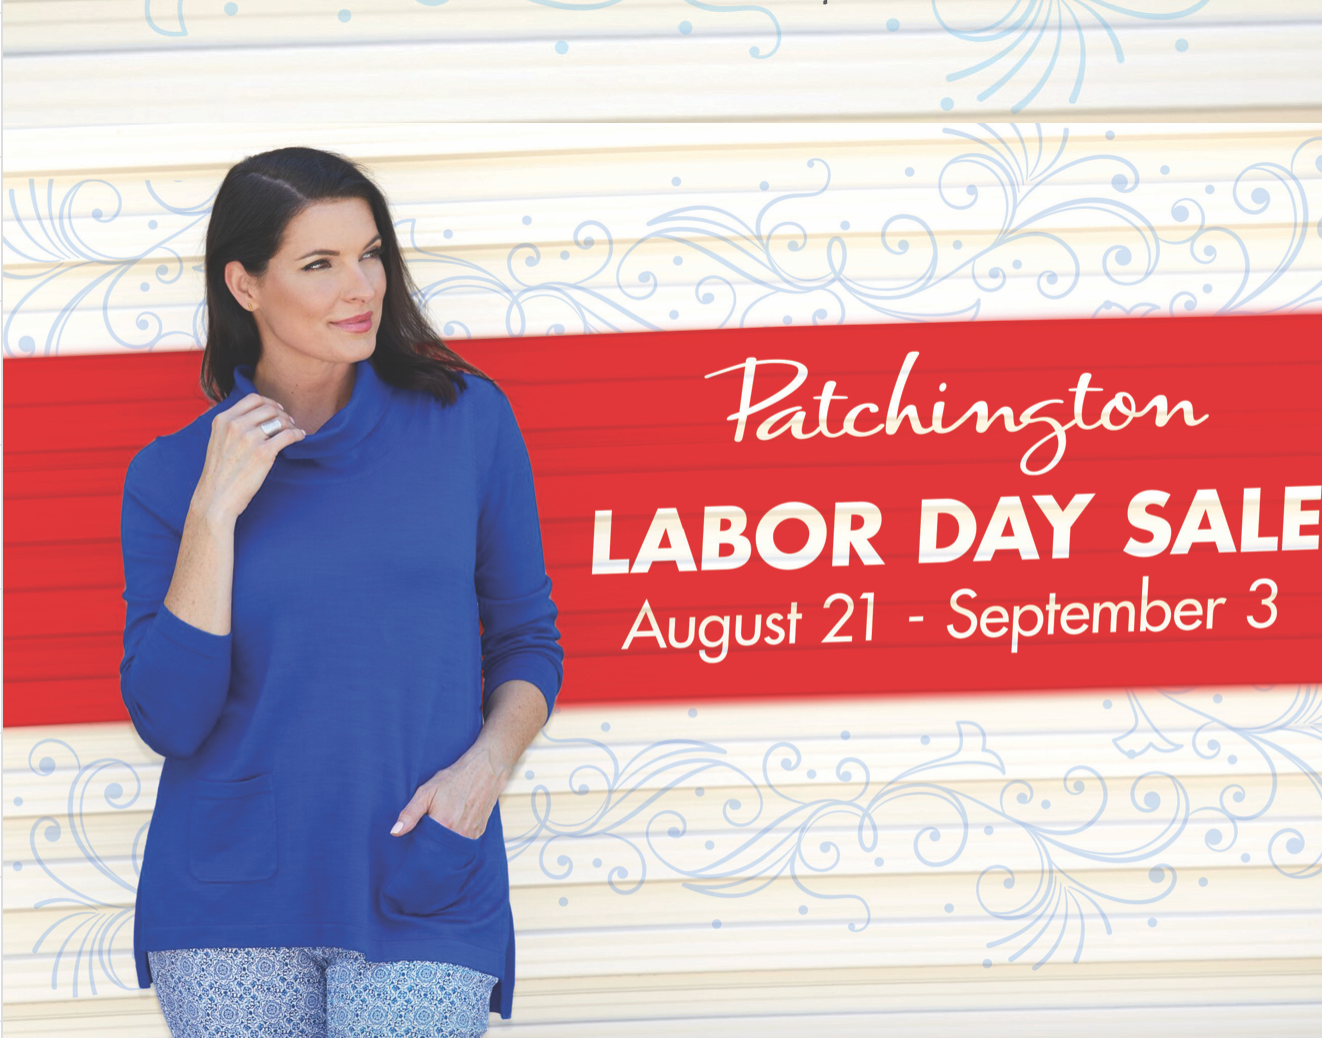 Patchington Labor Day Sale, The Village Shops on Venetian Bay